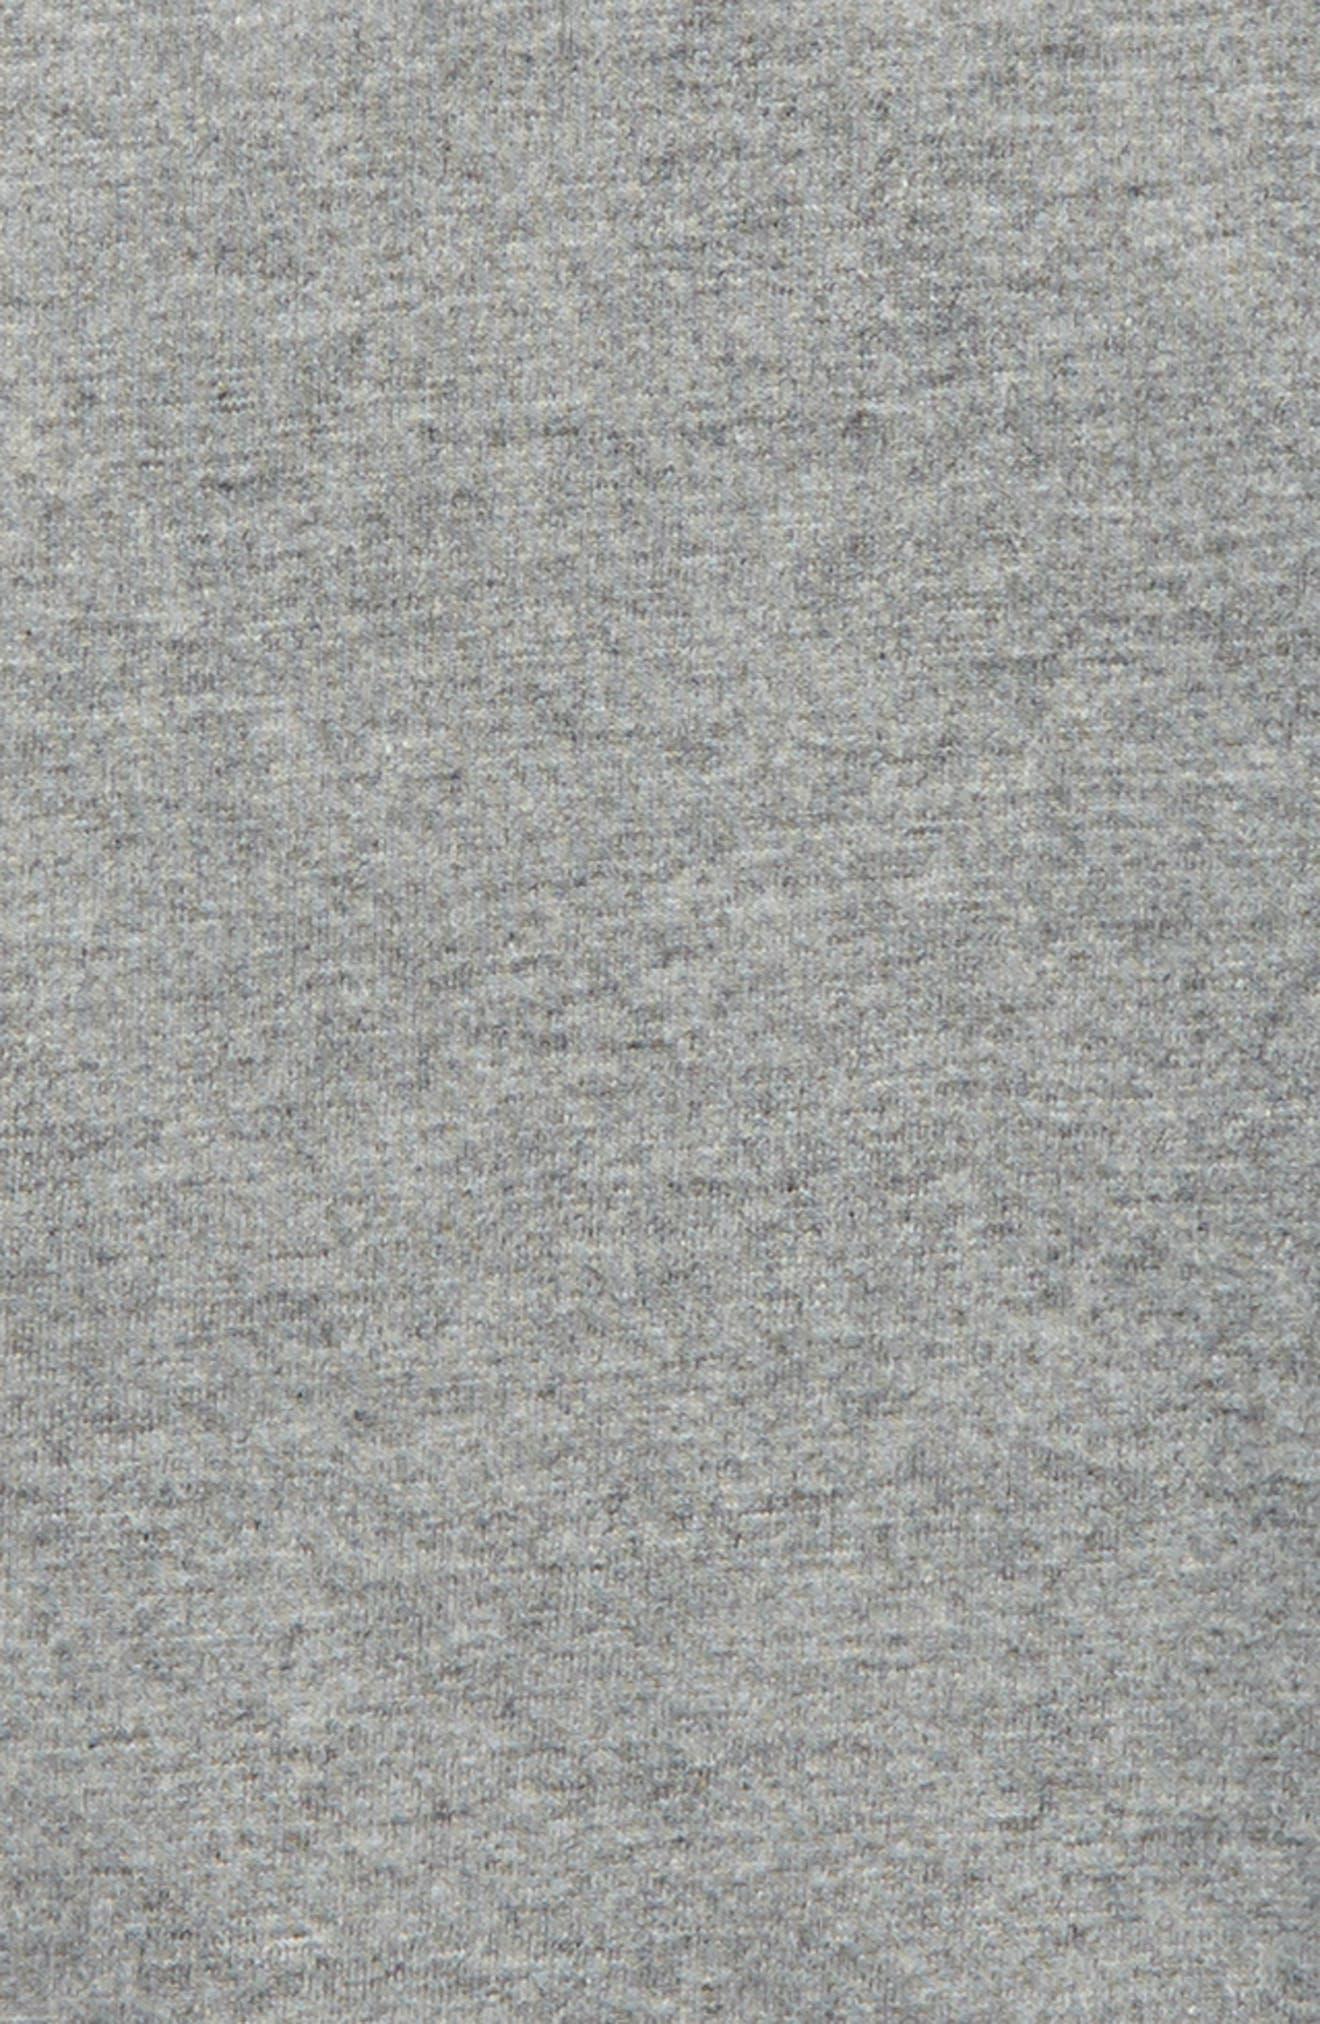 Shaggy Lined Sweatshirt,                             Alternate thumbnail 2, color,                             062